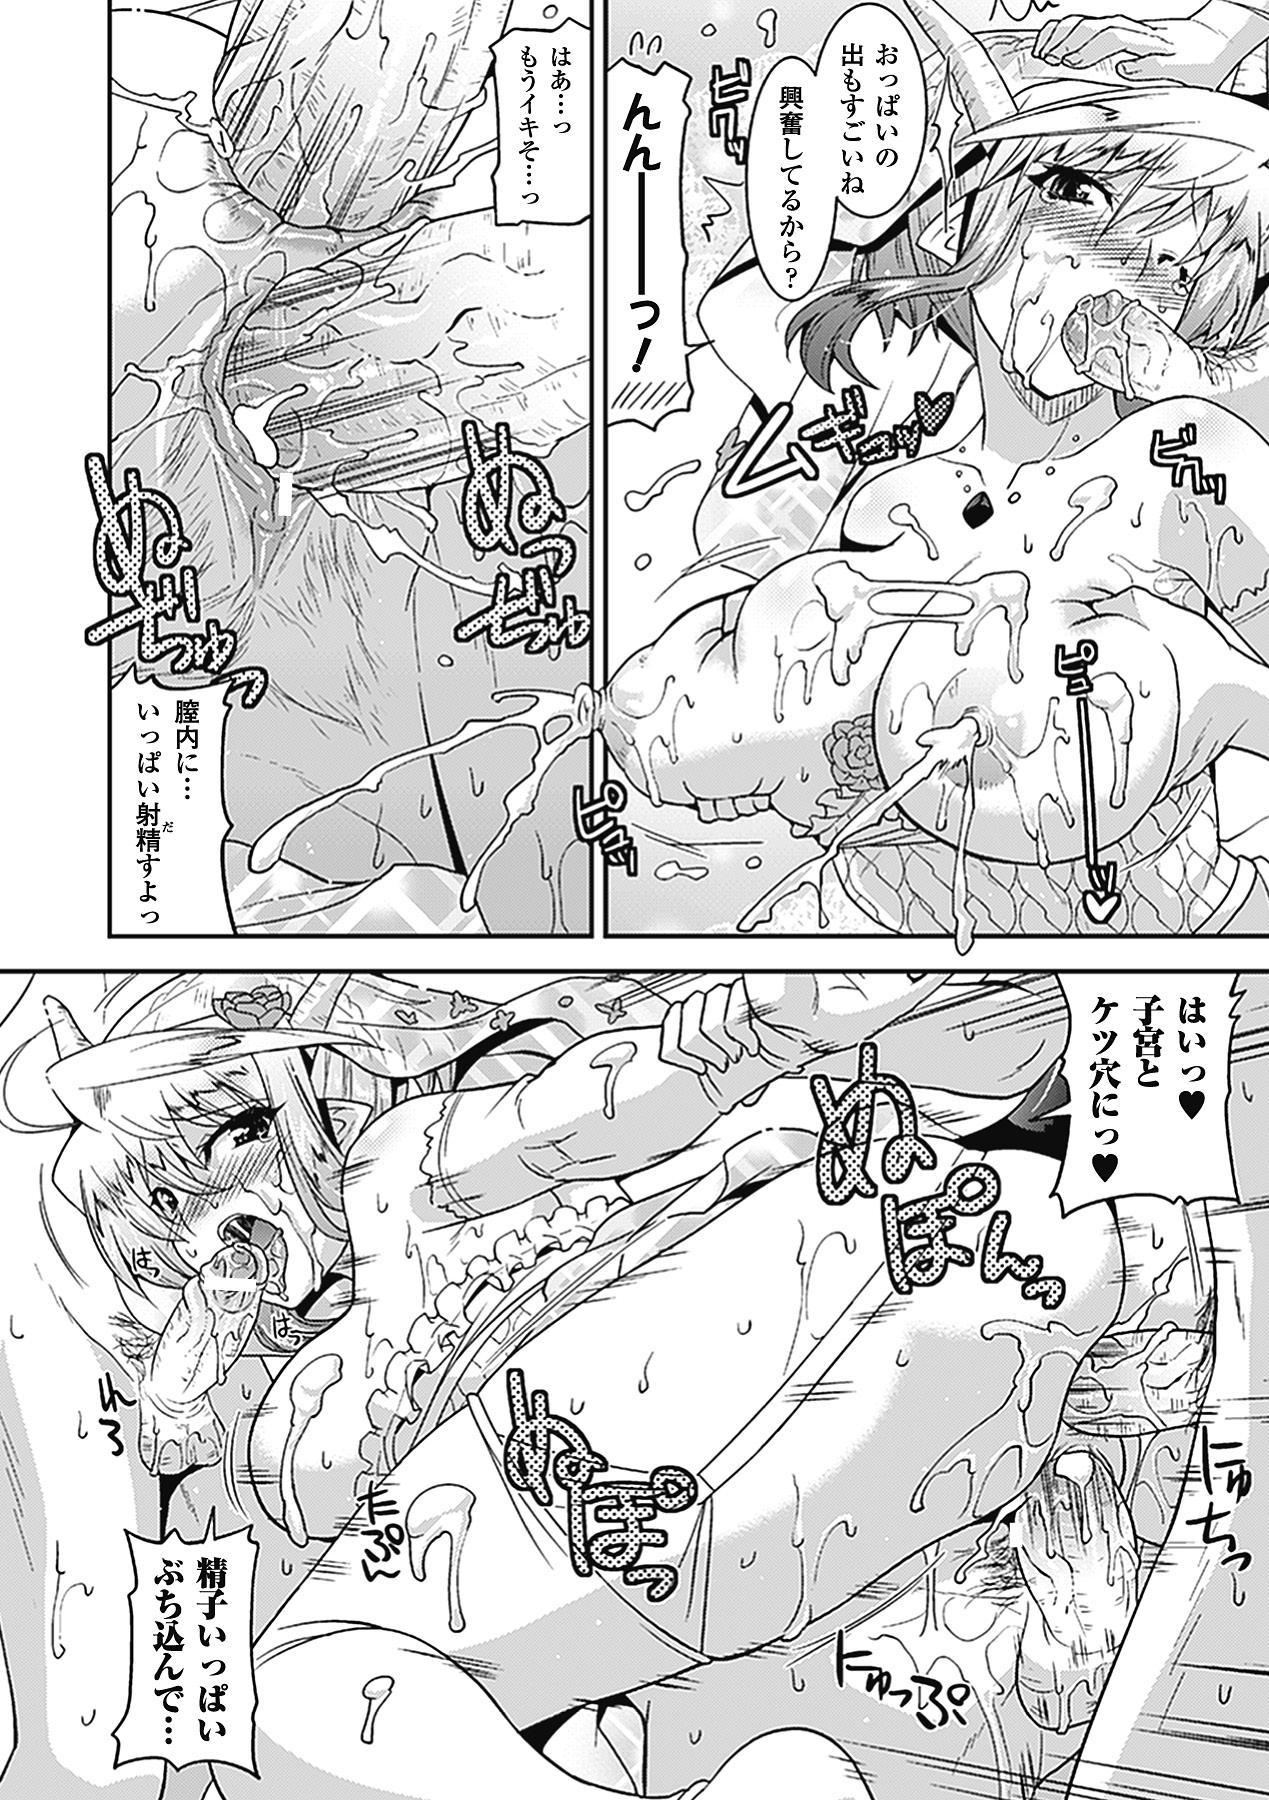 Megami Crisis 5 19